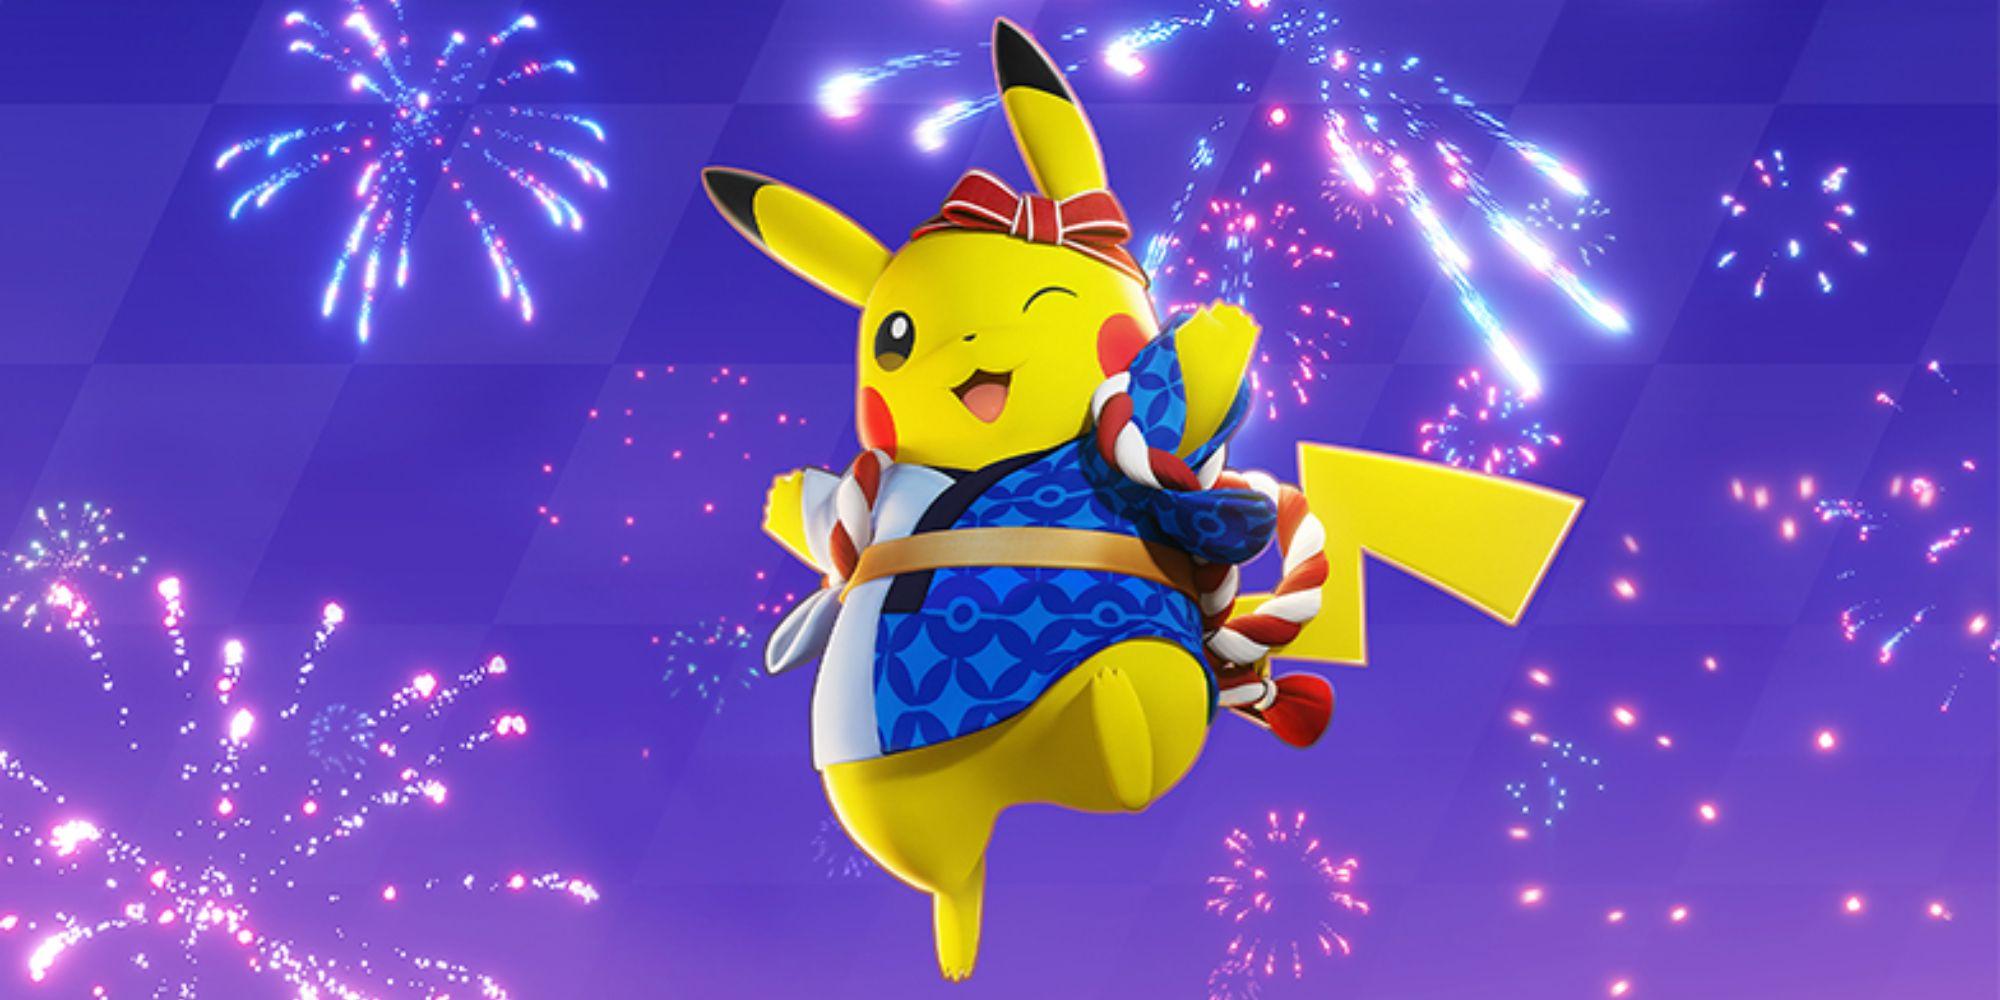 Pokemon Unite Passes 9 Million Downloads, Gives Away 2,000 Aeos Tickets